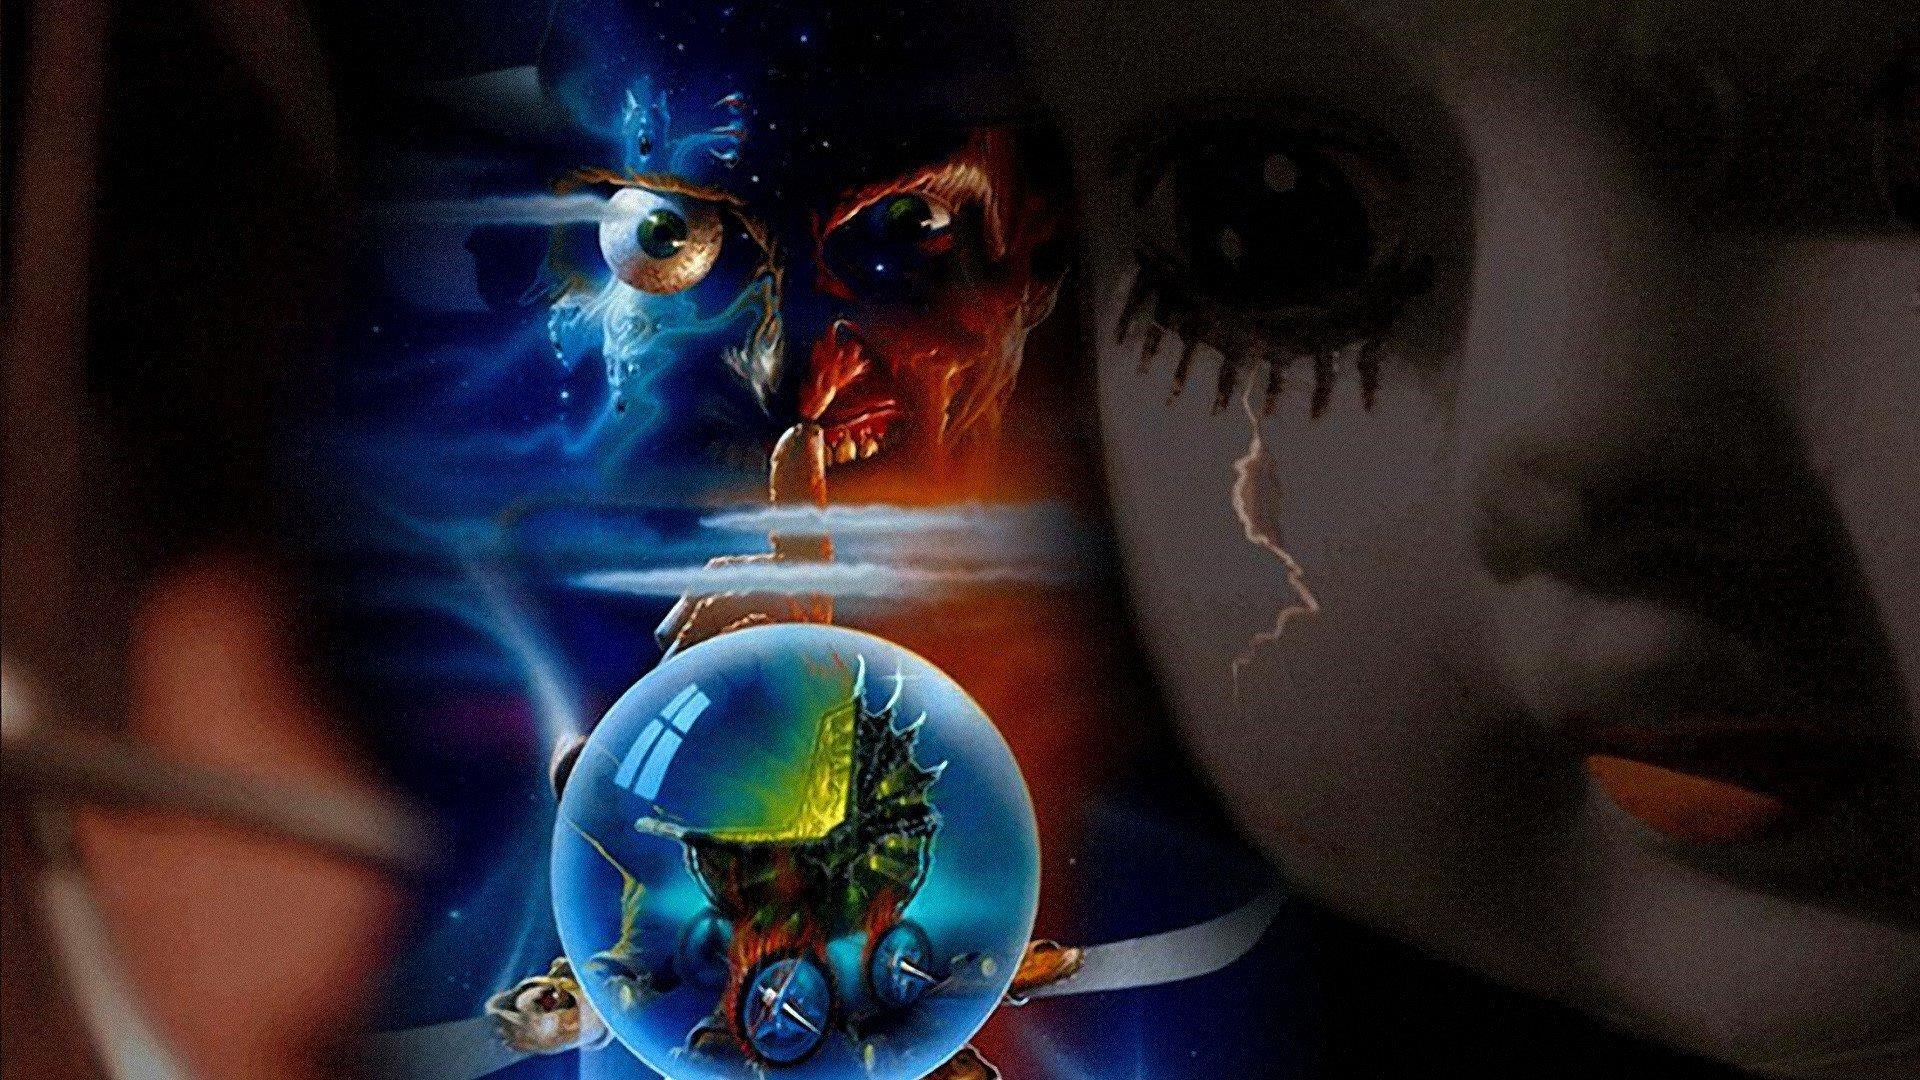 A Nightmare On Elm Street 5 The Dream Child Hd Wallpaper